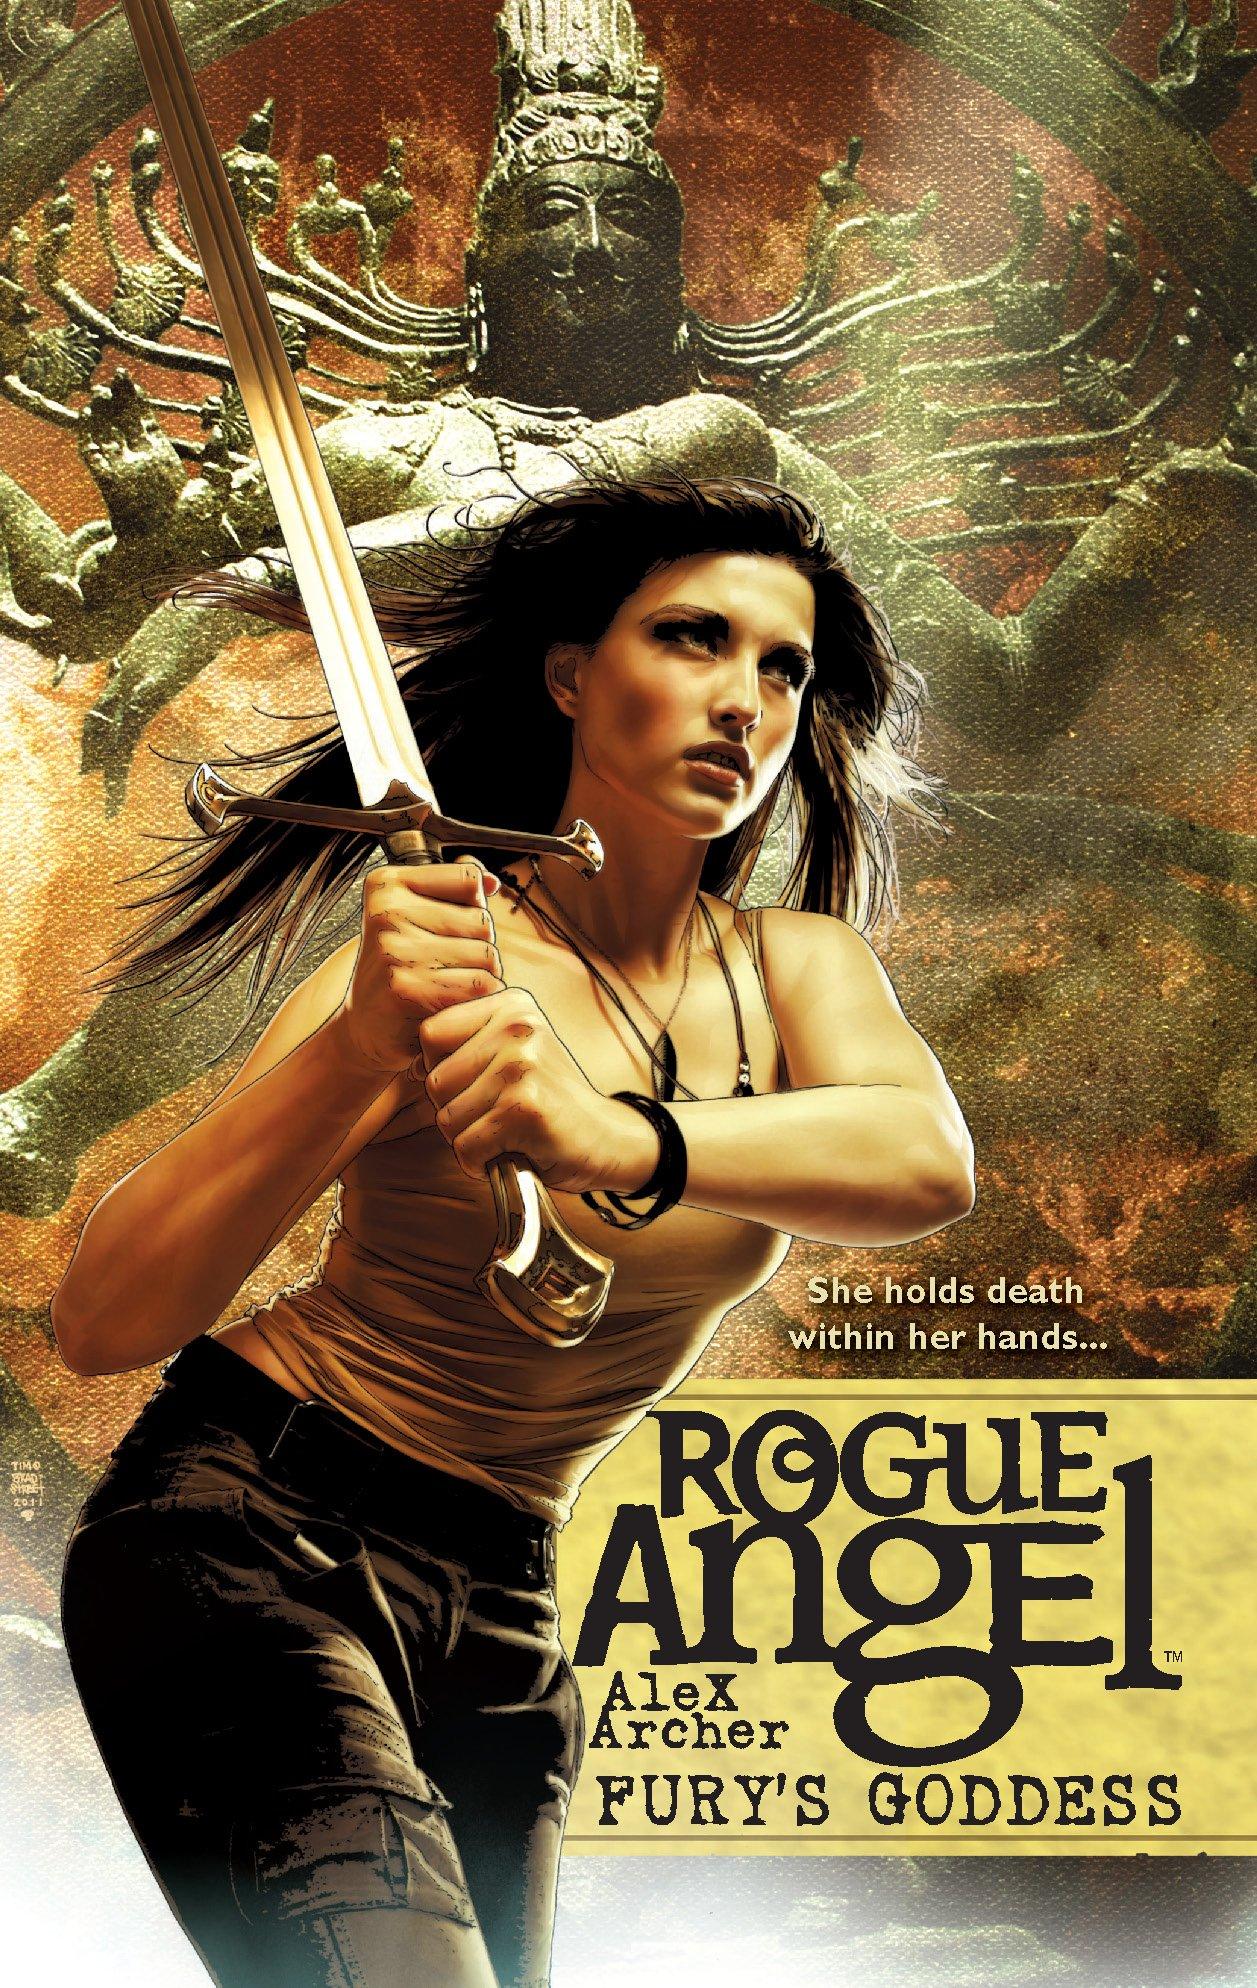 Amazon.com: Fury's Goddess (Rogue Angel) (9780373621552): Alex Archer: Books